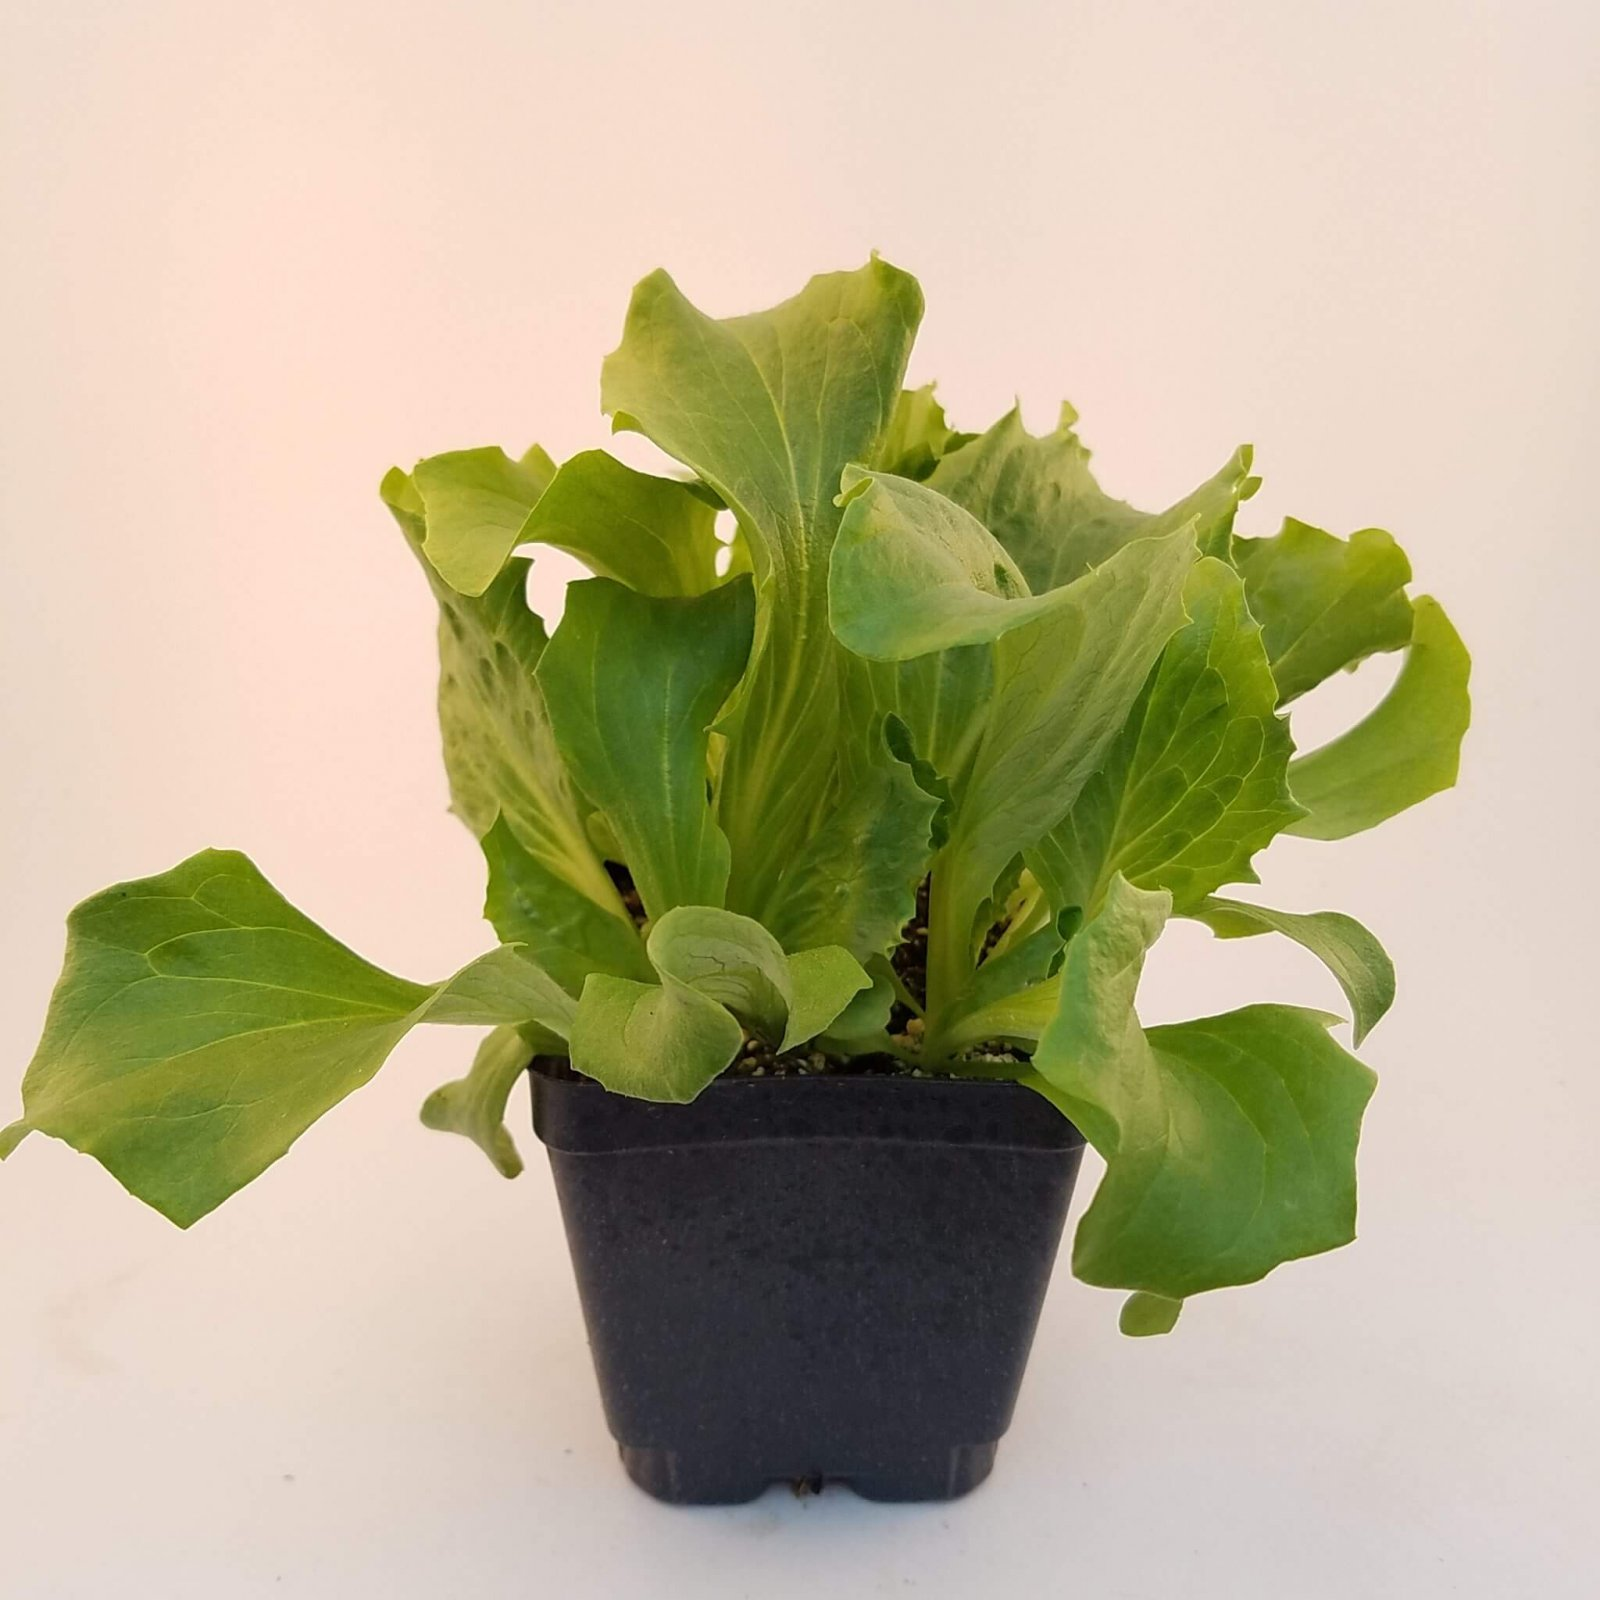 Lettuce 'Caretaker' (Head lettuce) - LM-18